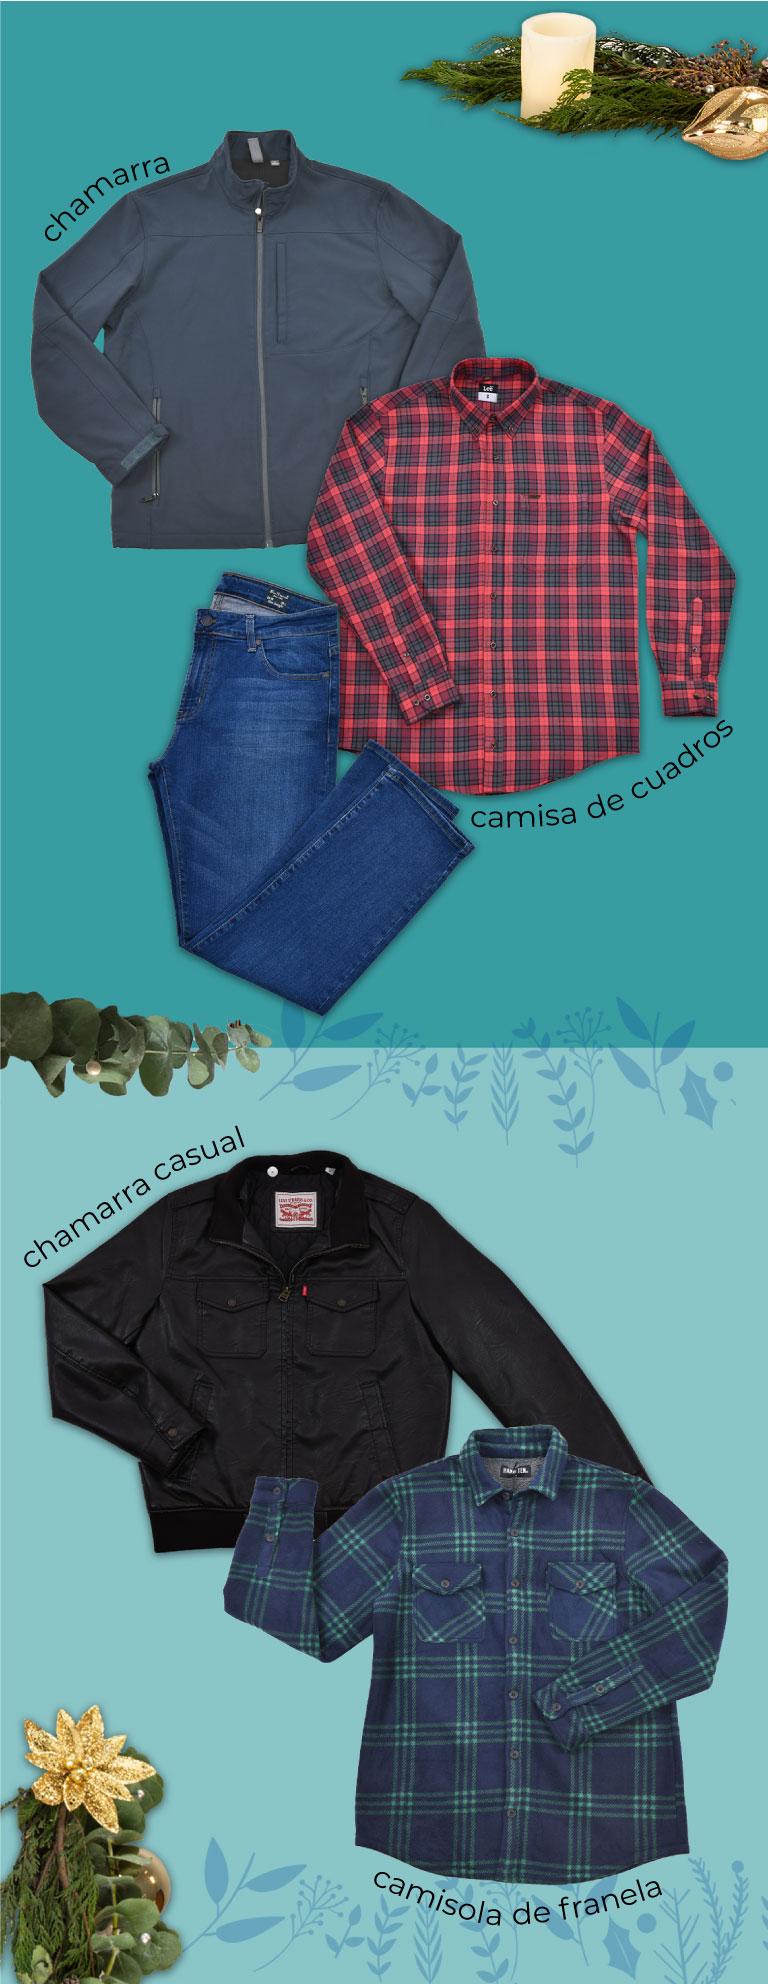 chamarra, camisa de cuadros, pantalón de mezclilla, chamarra casual, camisola de franela